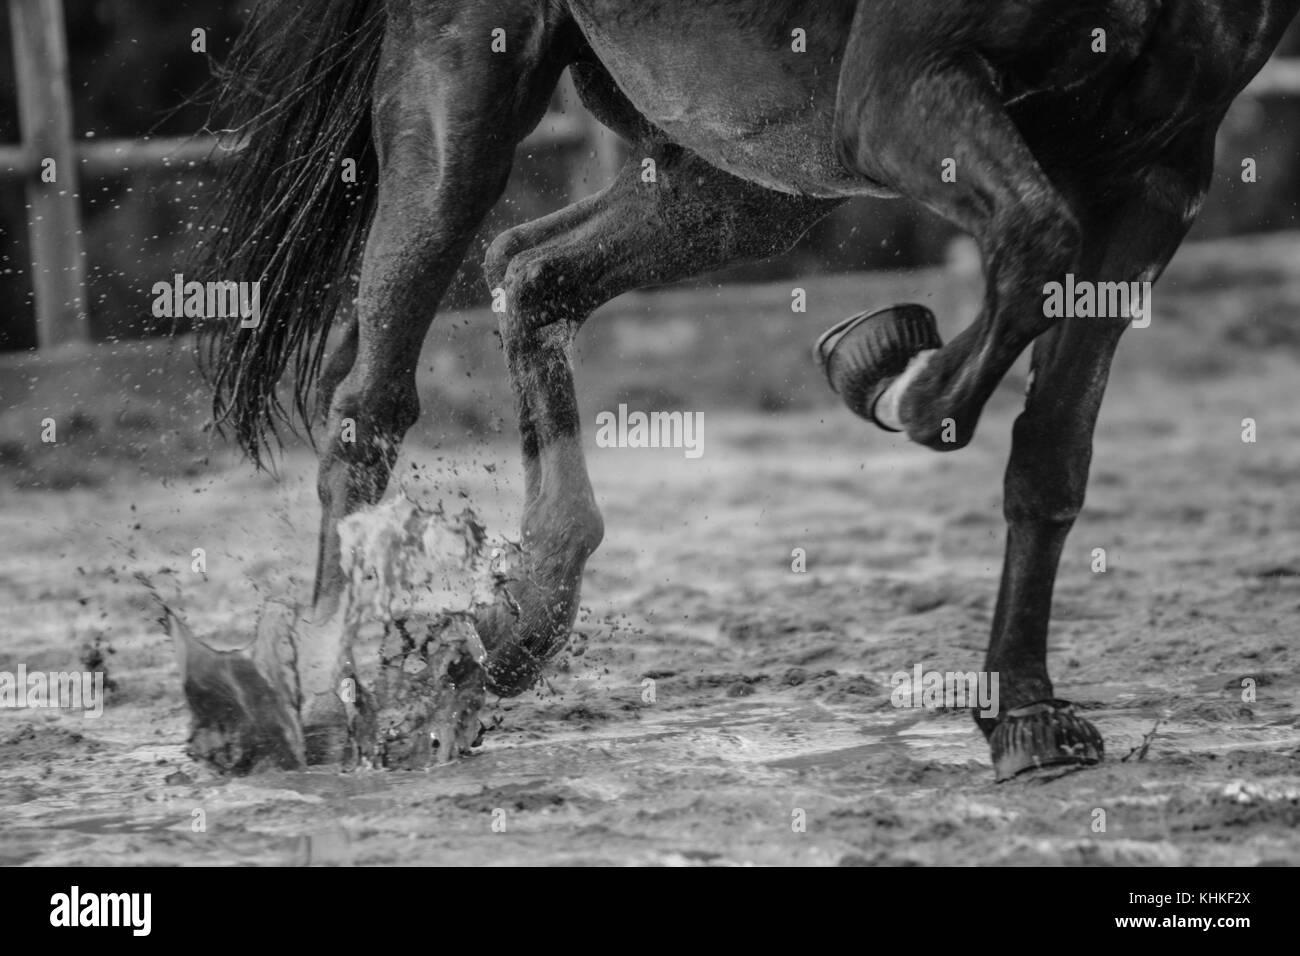 Just Legs - Stock Image